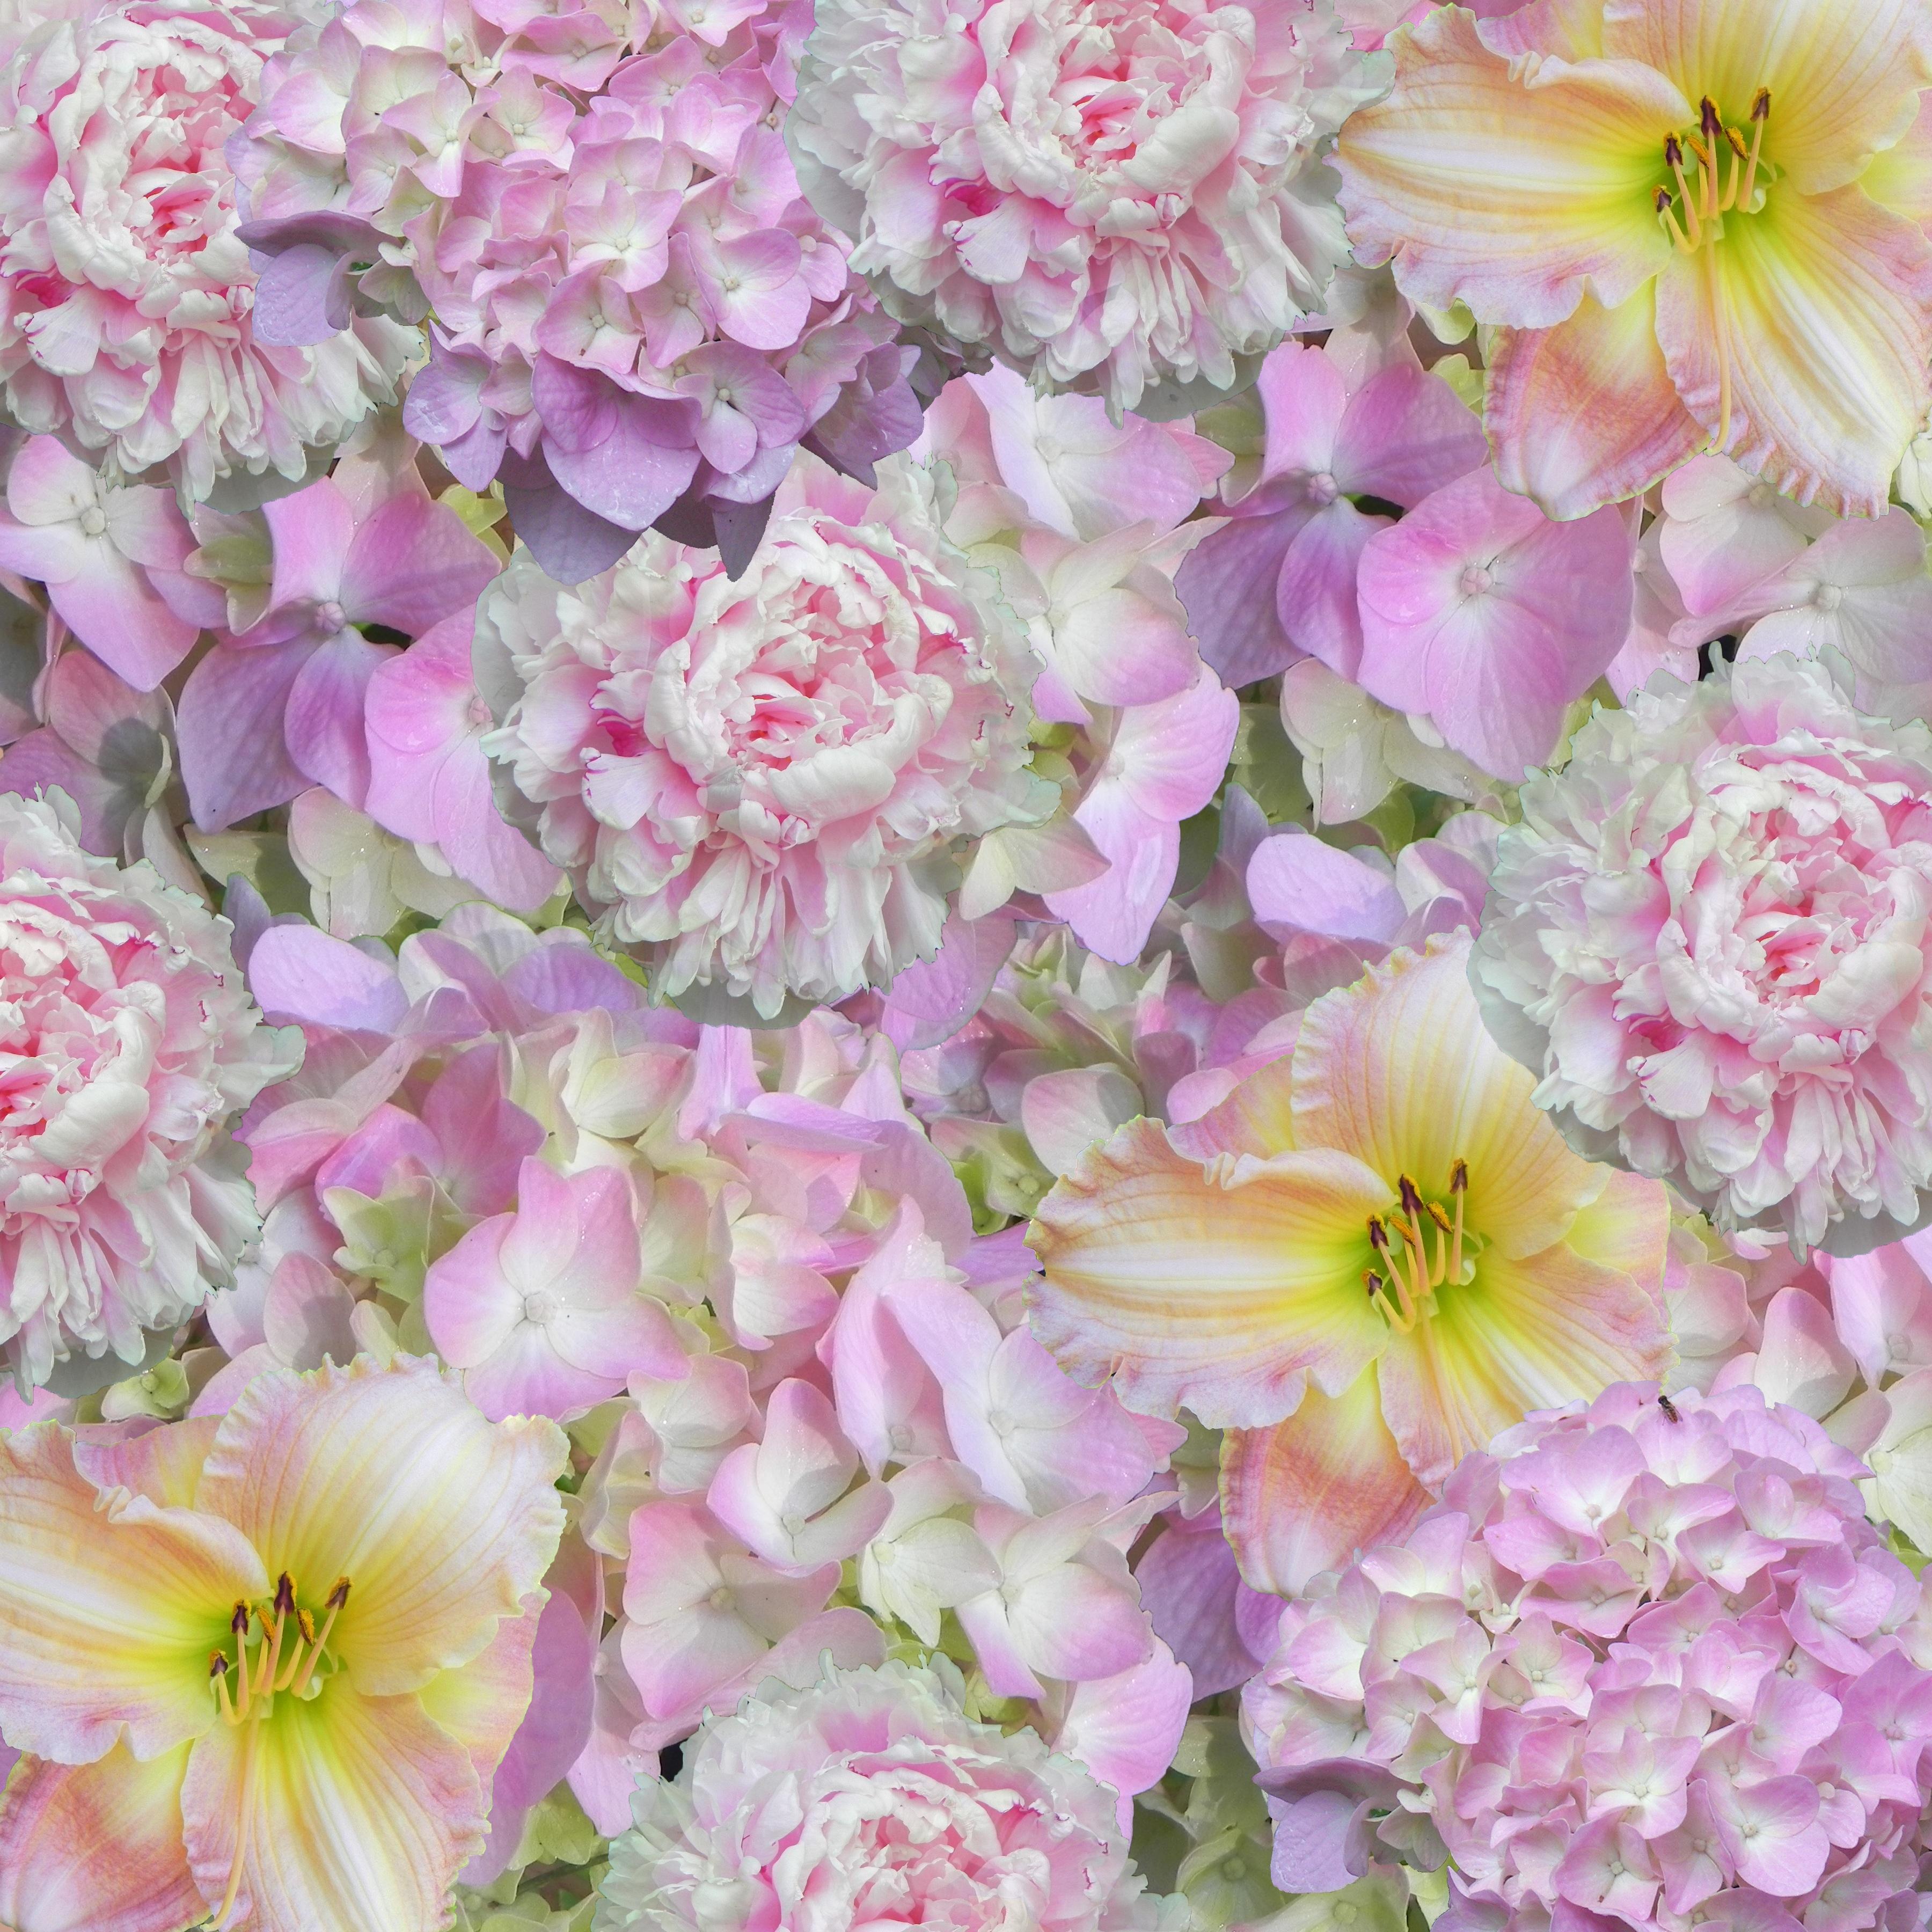 Free Images Blossom Texture Petal Floral Pink Flora Design